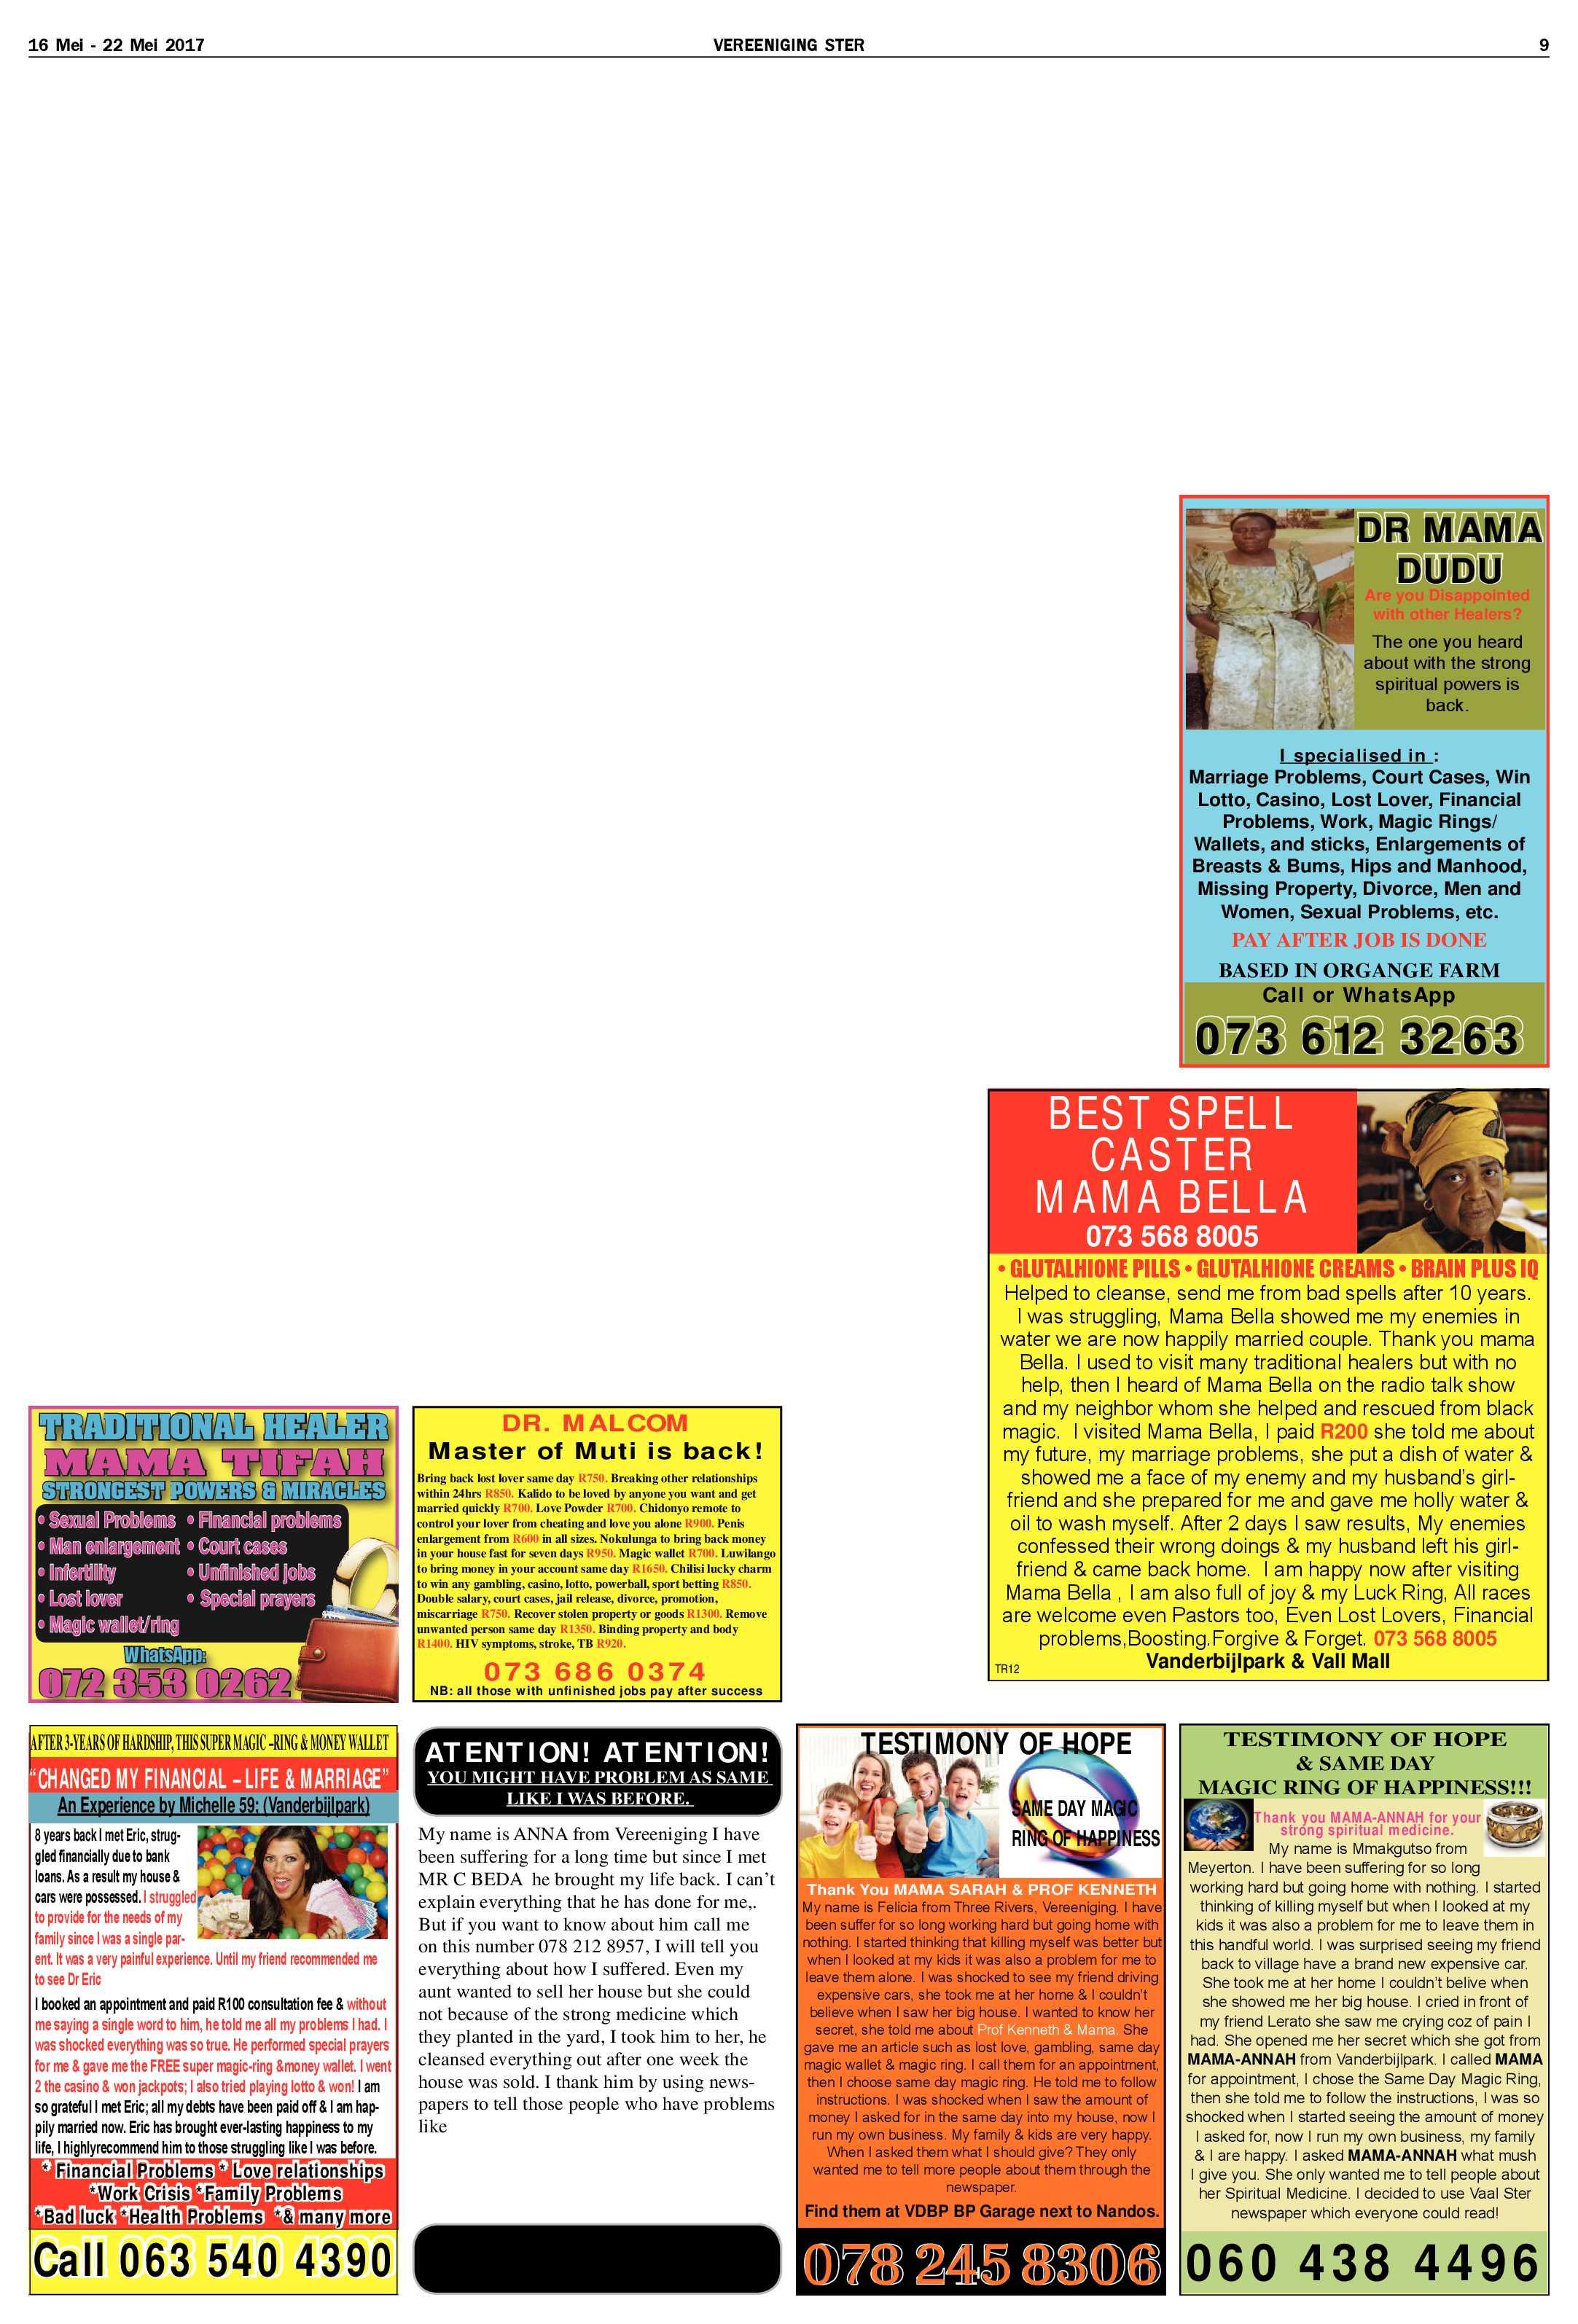 vereeniging-ster-16-22-mei-2017-epapers-page-9